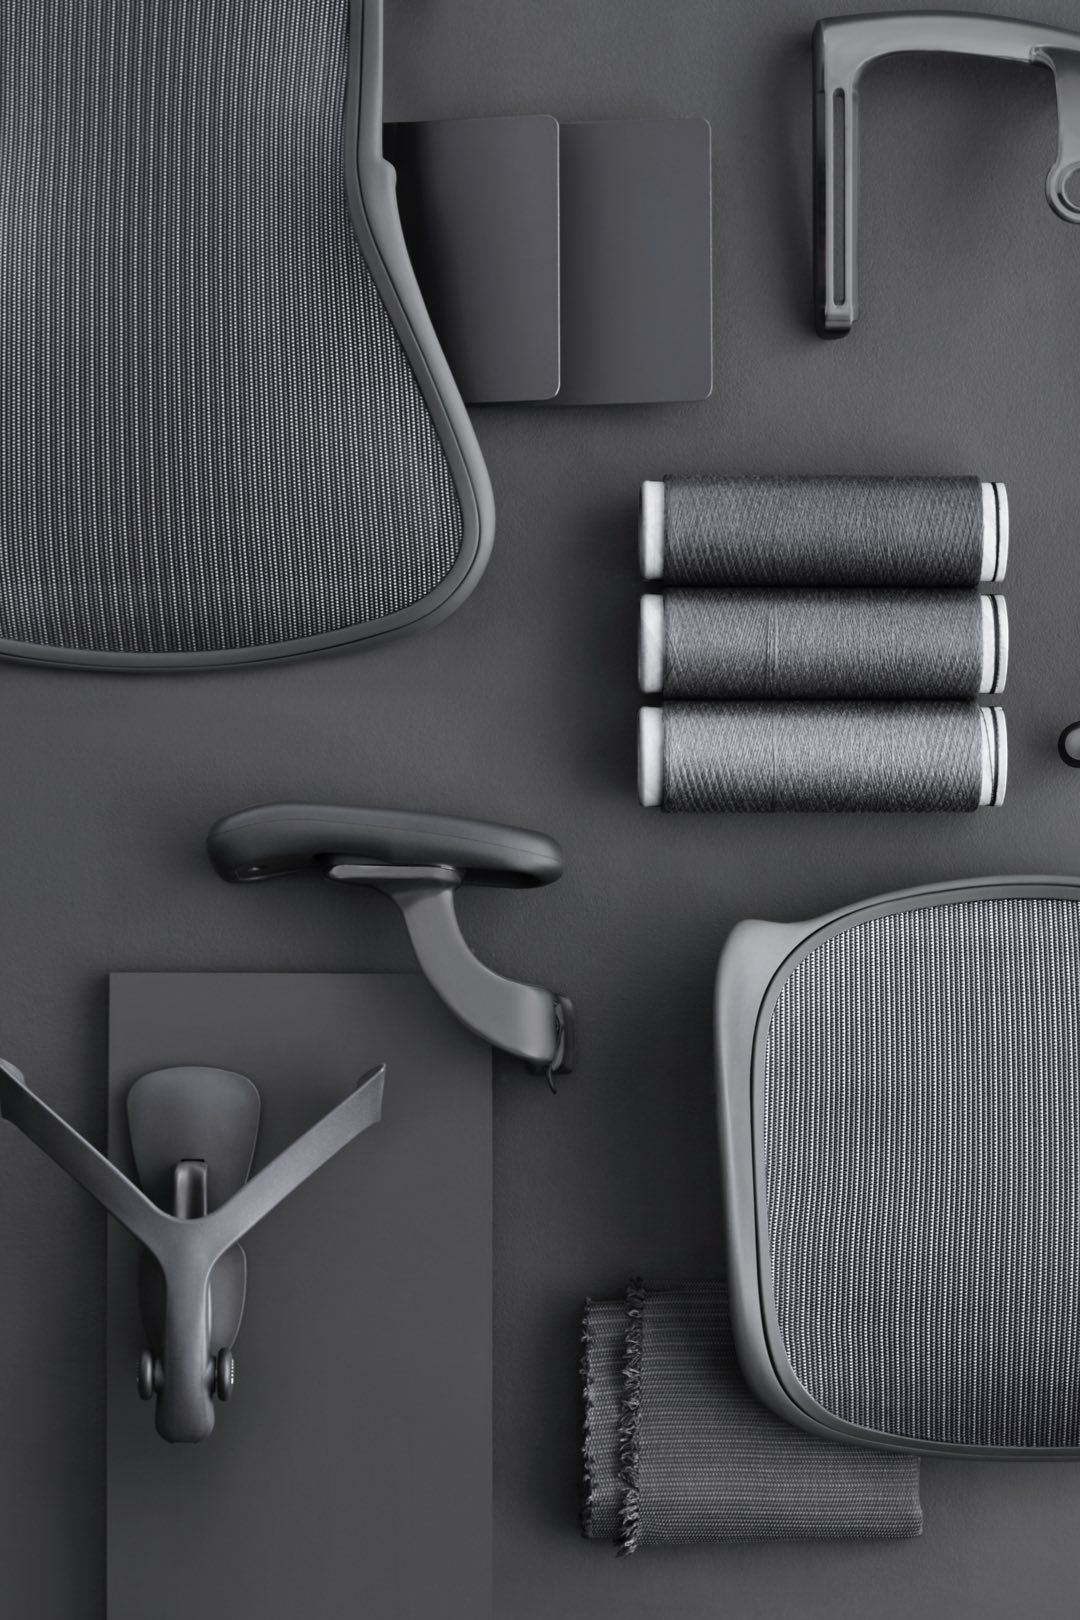 Aeron Chairs Remastered Workspace Studio